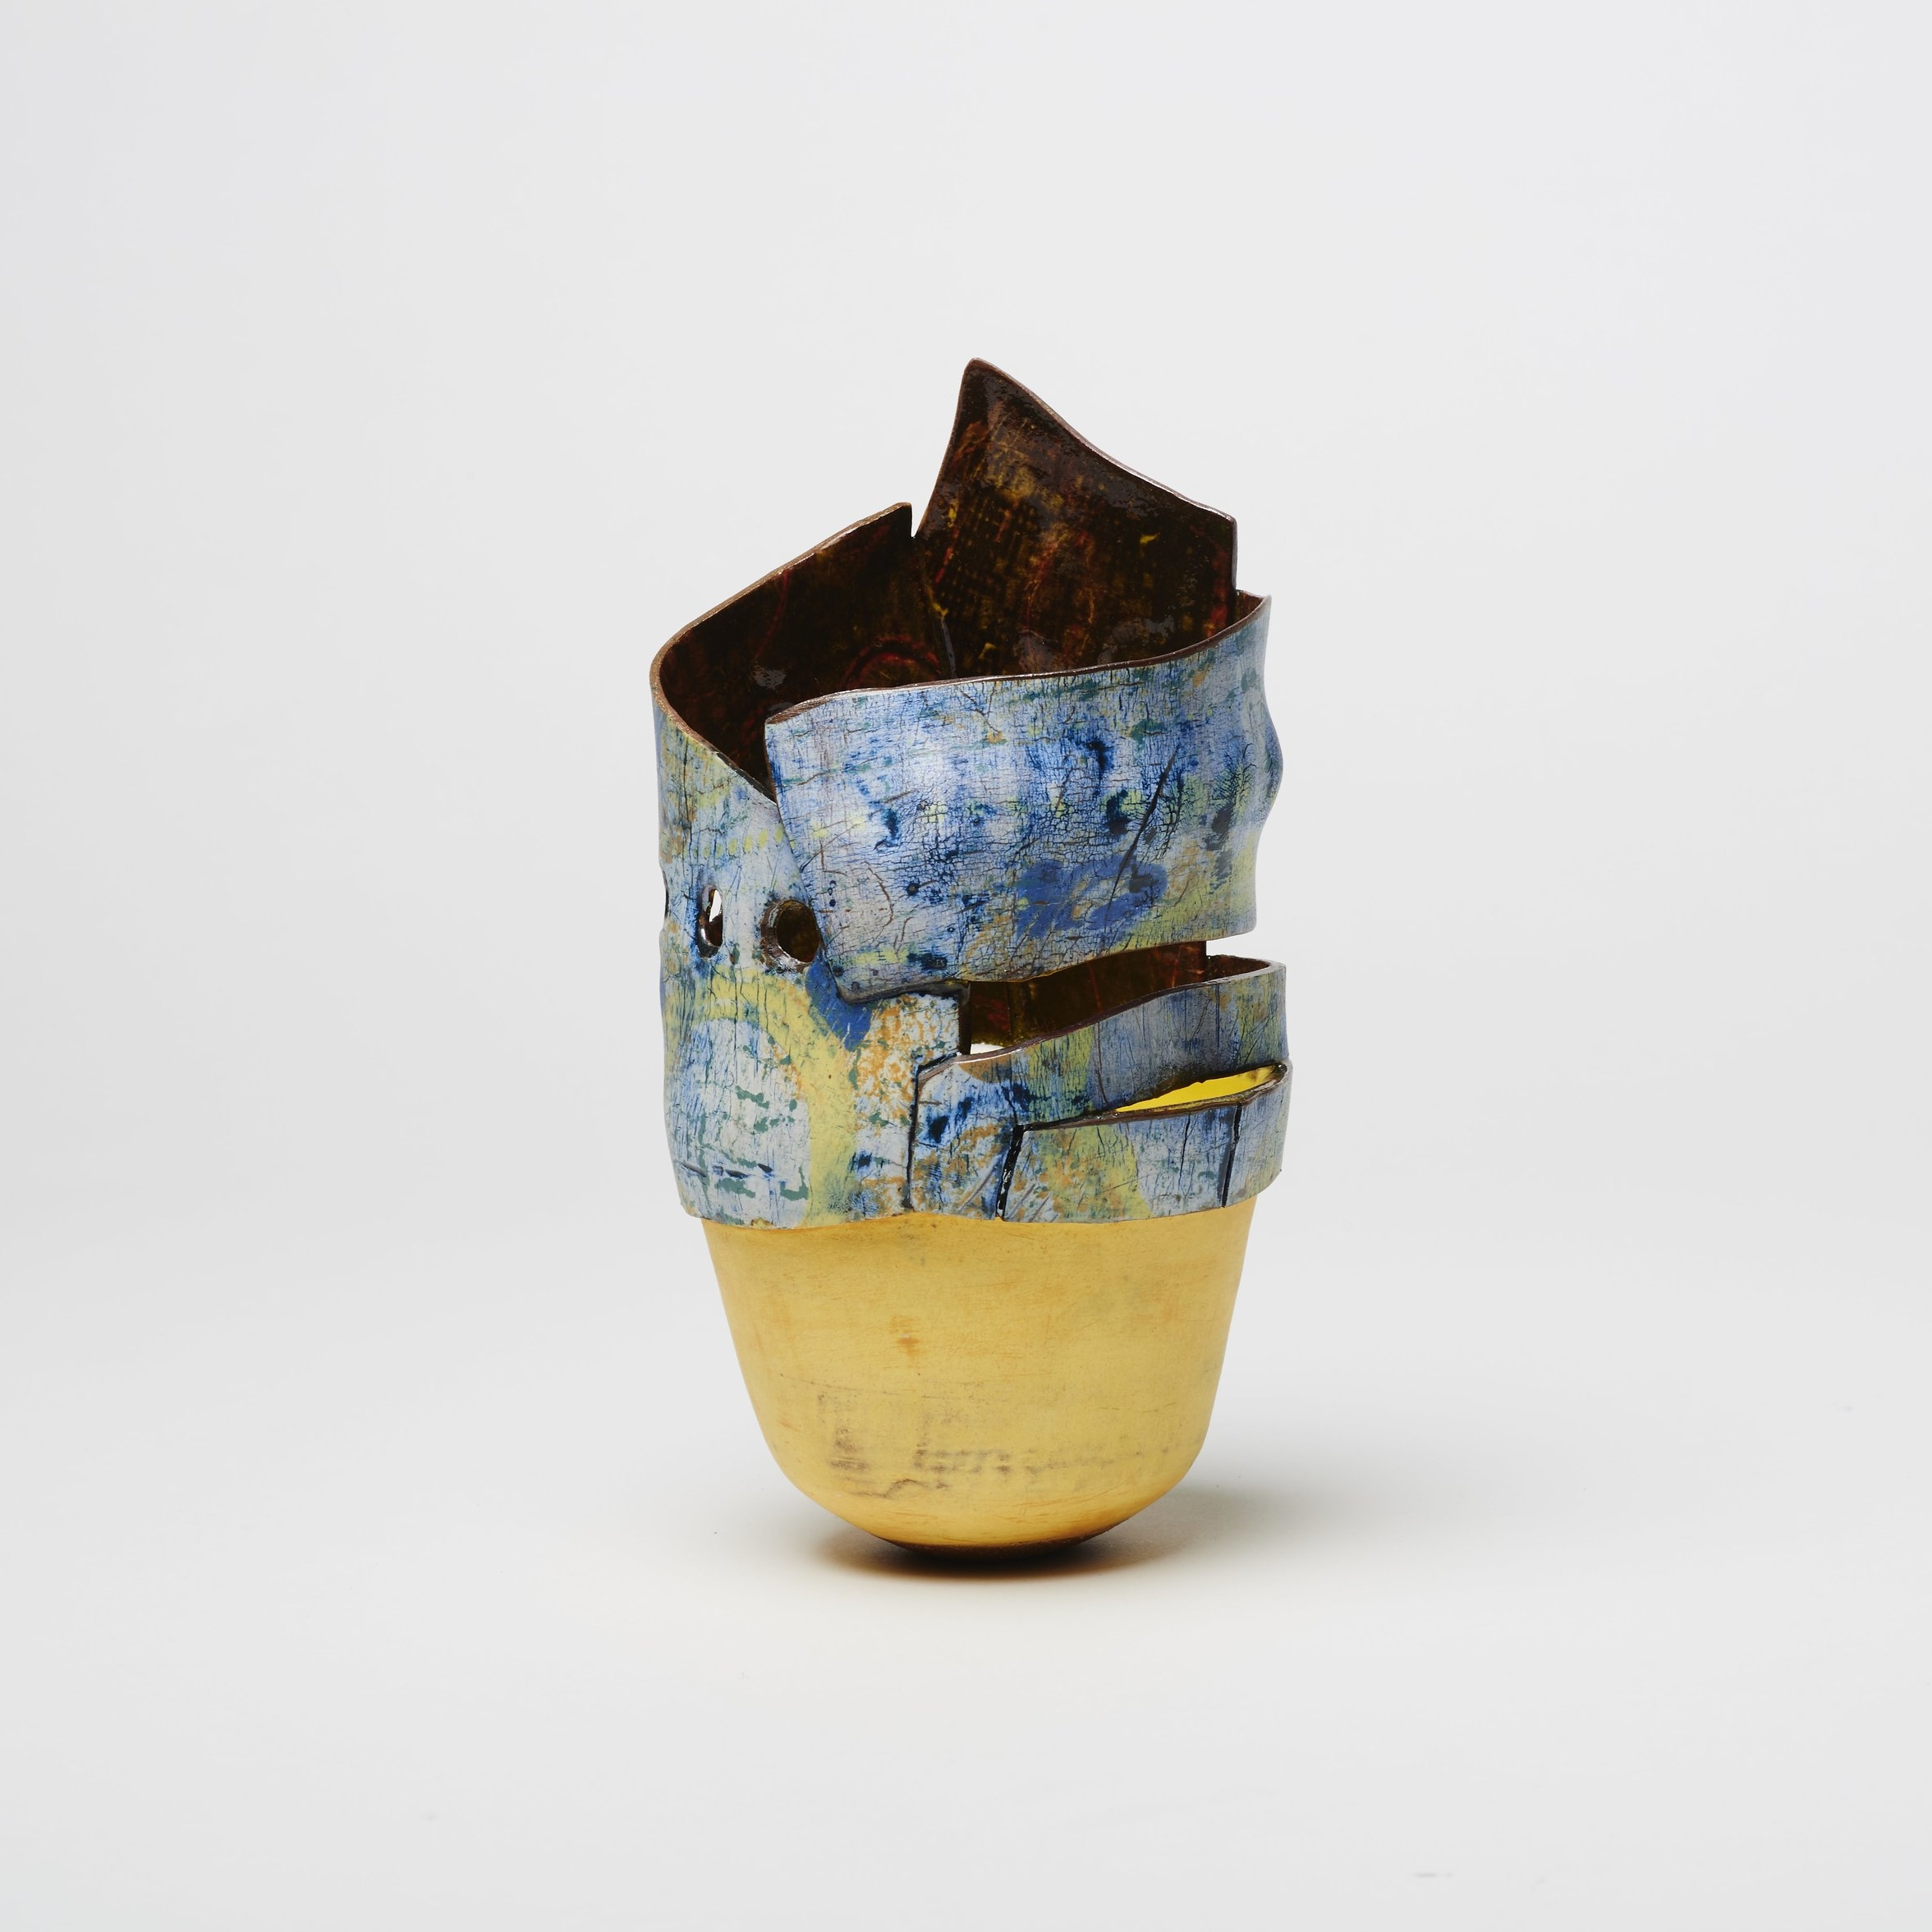 Fo , 2015 Terracotta 21 x 10cm